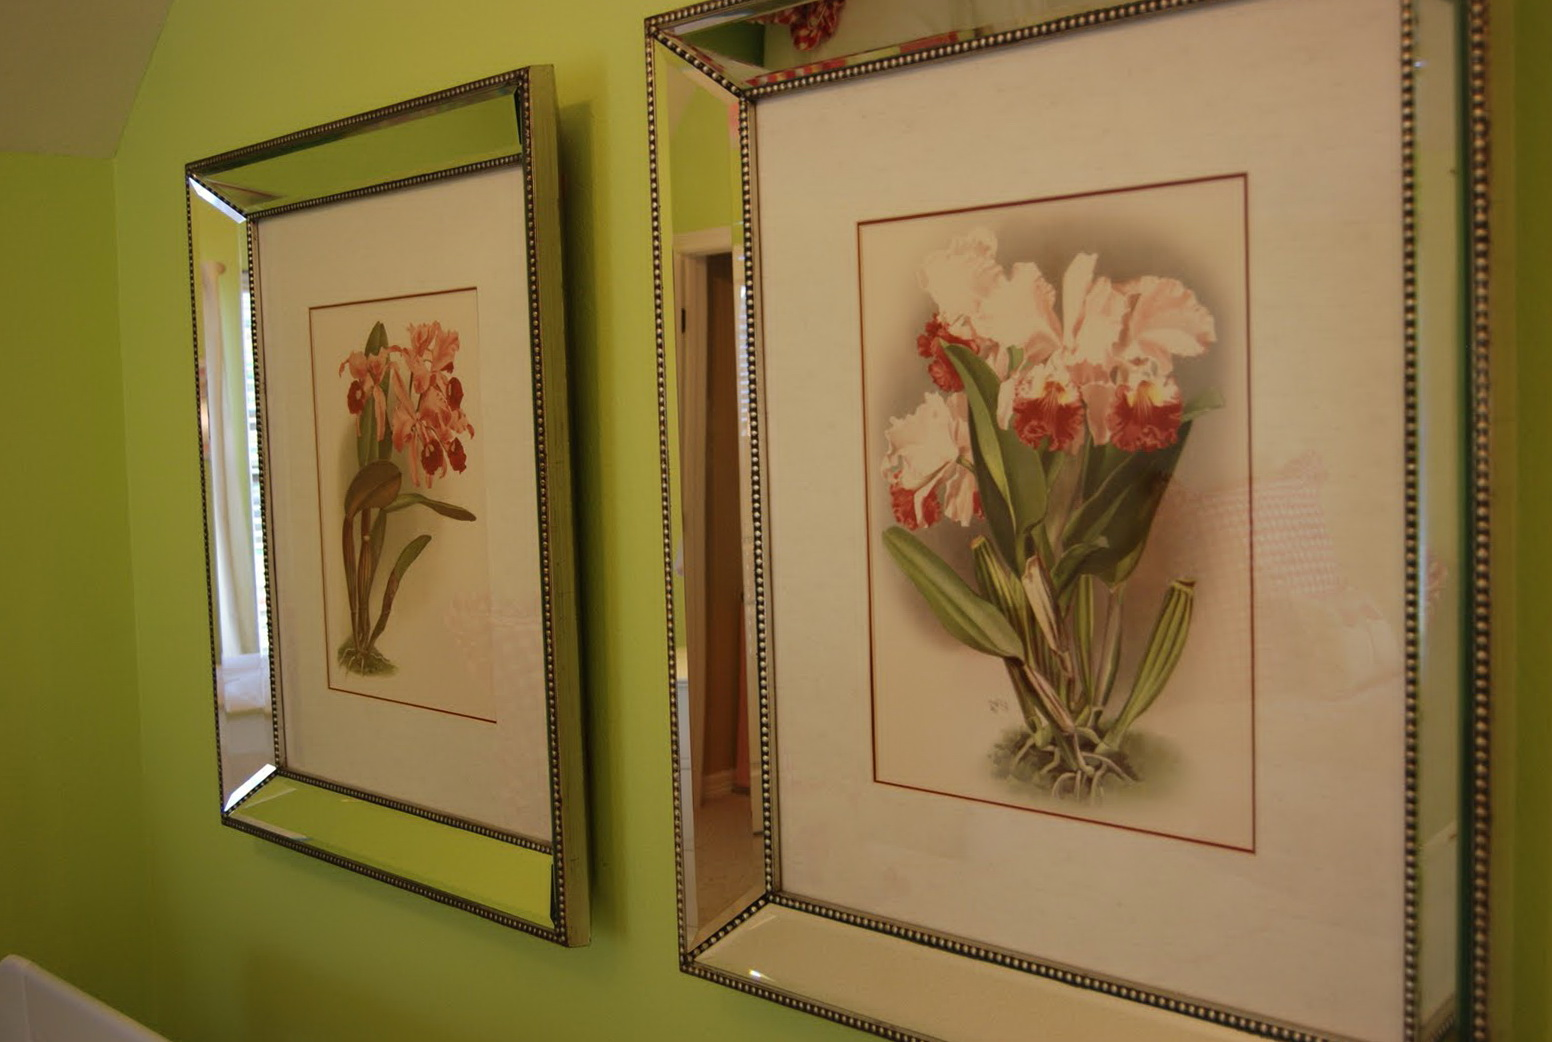 Tahari Mirrored Picture Frames